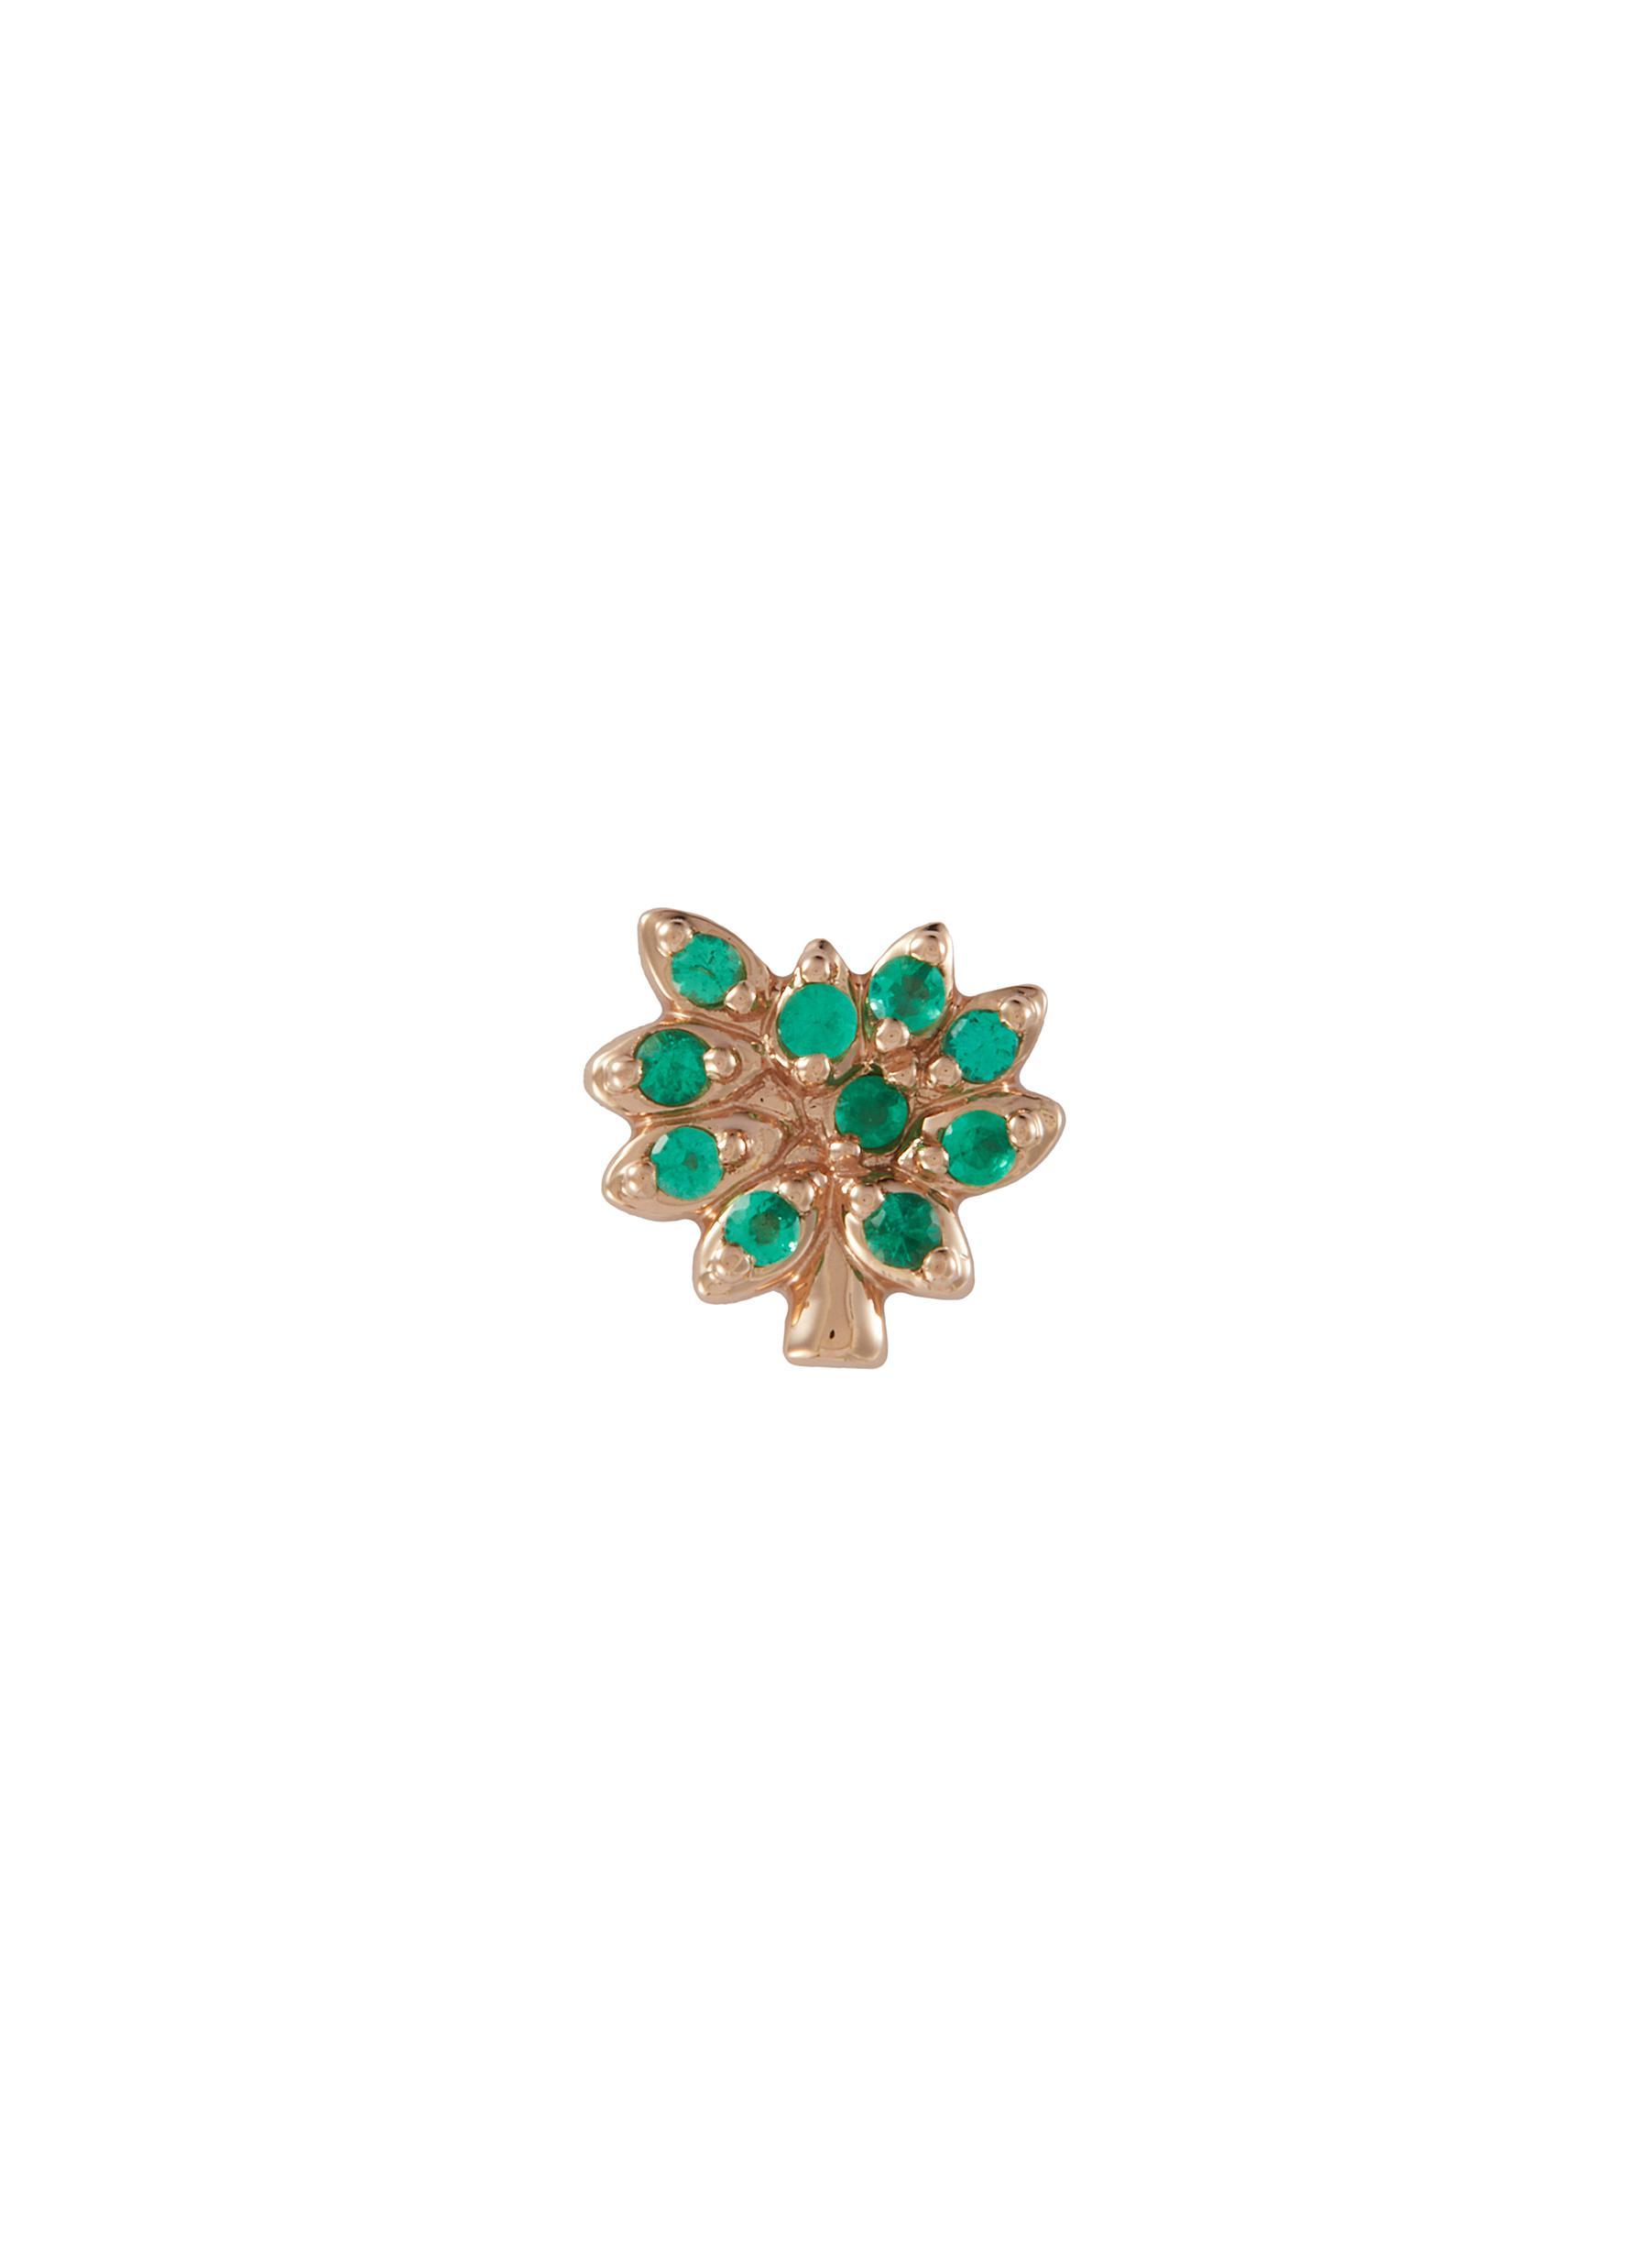 'Family Tree' Rhinestone 18k Rose Gold Charm